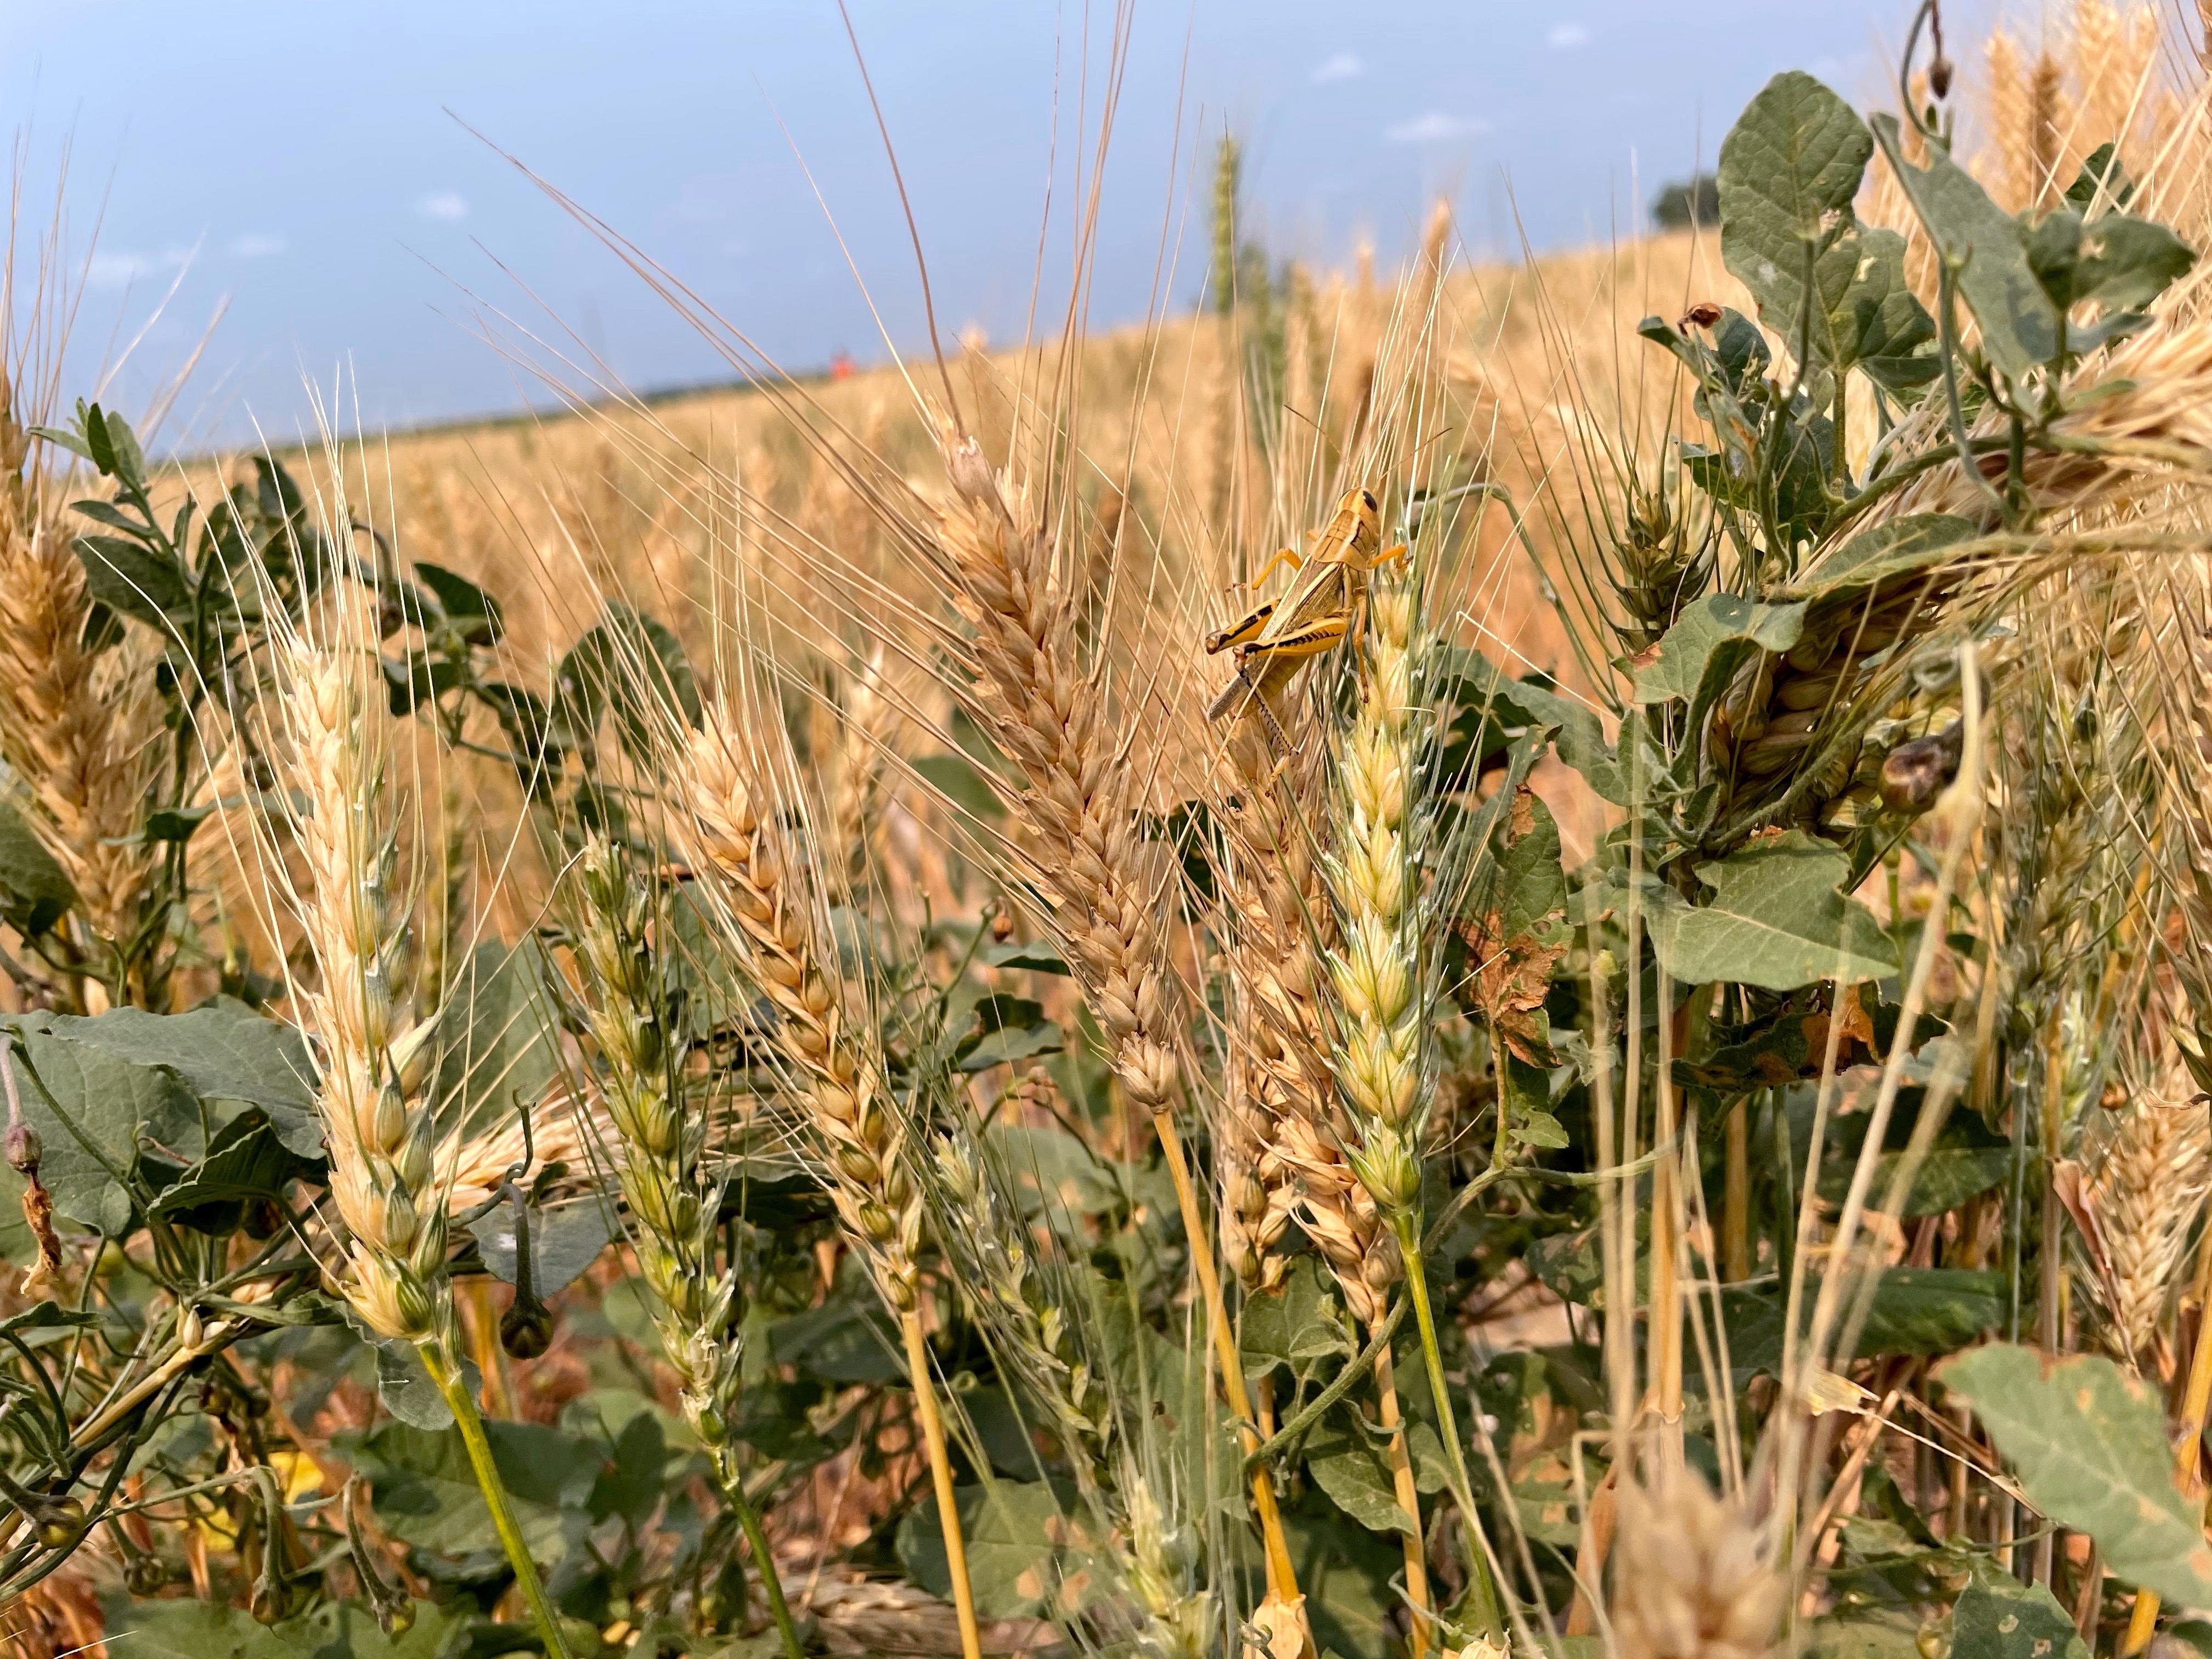 A grasshopper perches on a drought-stressed spring wheat plant near Bowdon, North Dakota, U.S. July 28, 2021.  REUTERS/Karl Plume